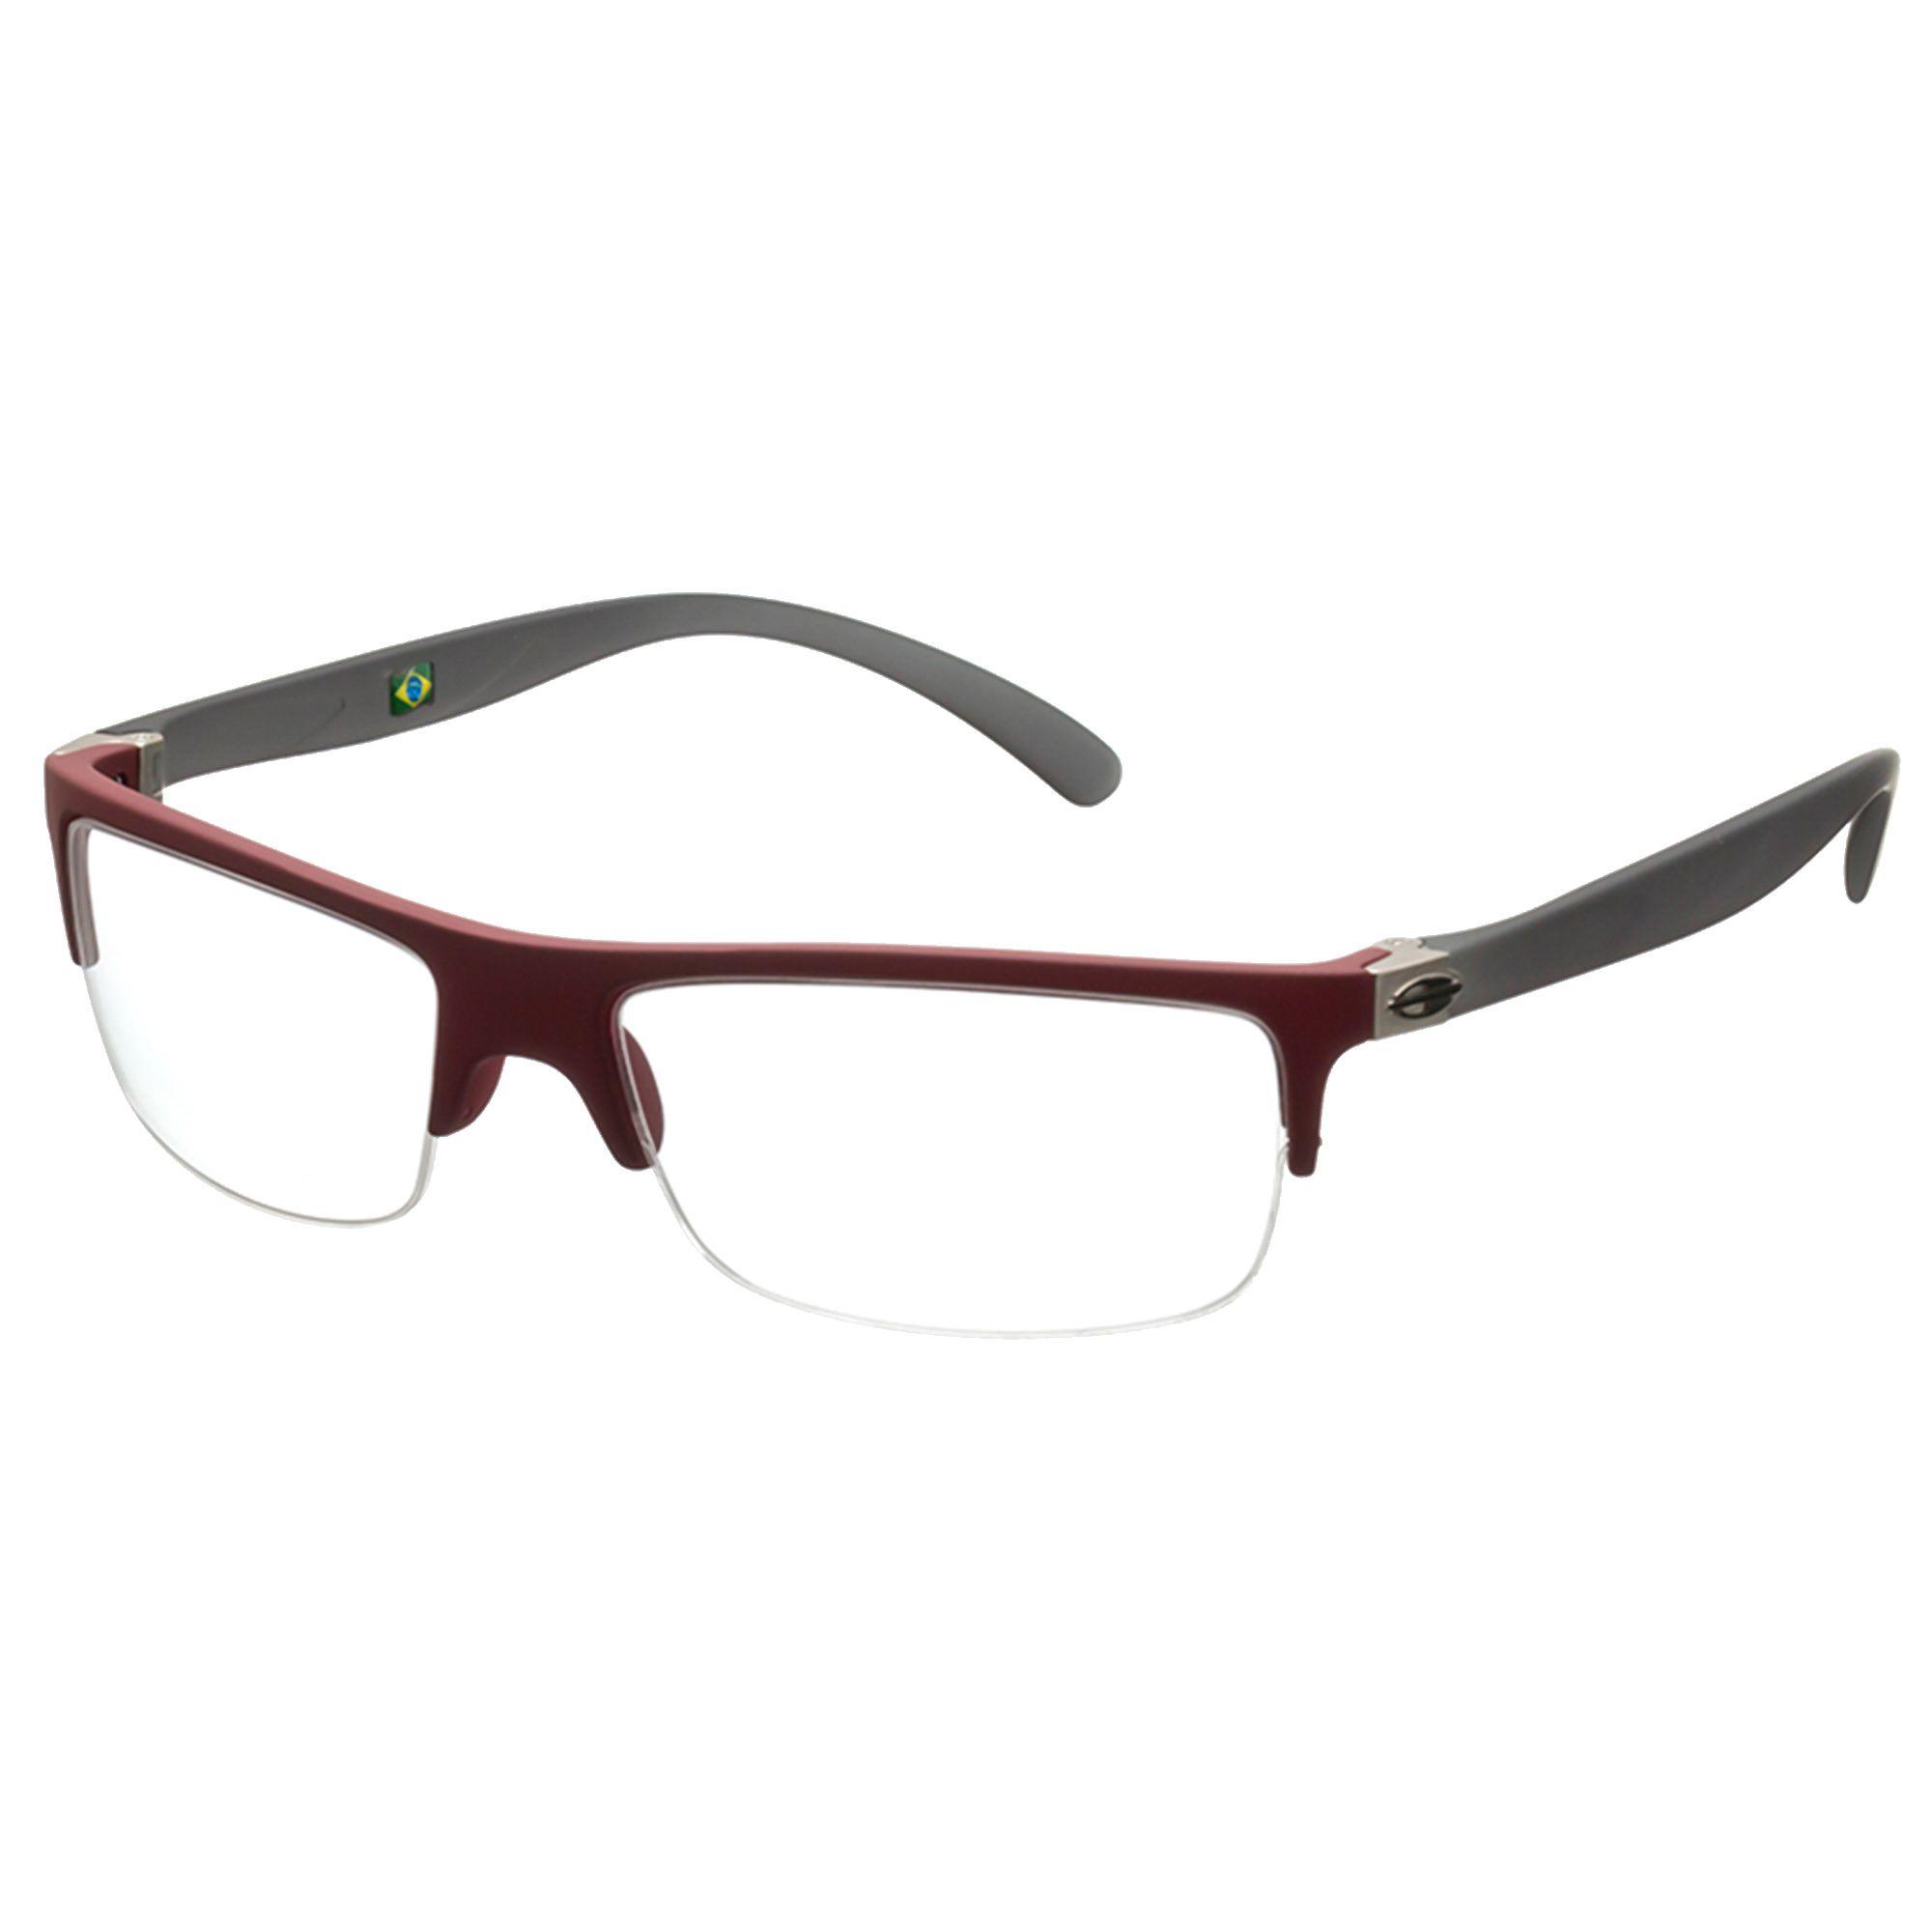 Óculos de Grau Masculino Mormaii Eclipse II 111388254